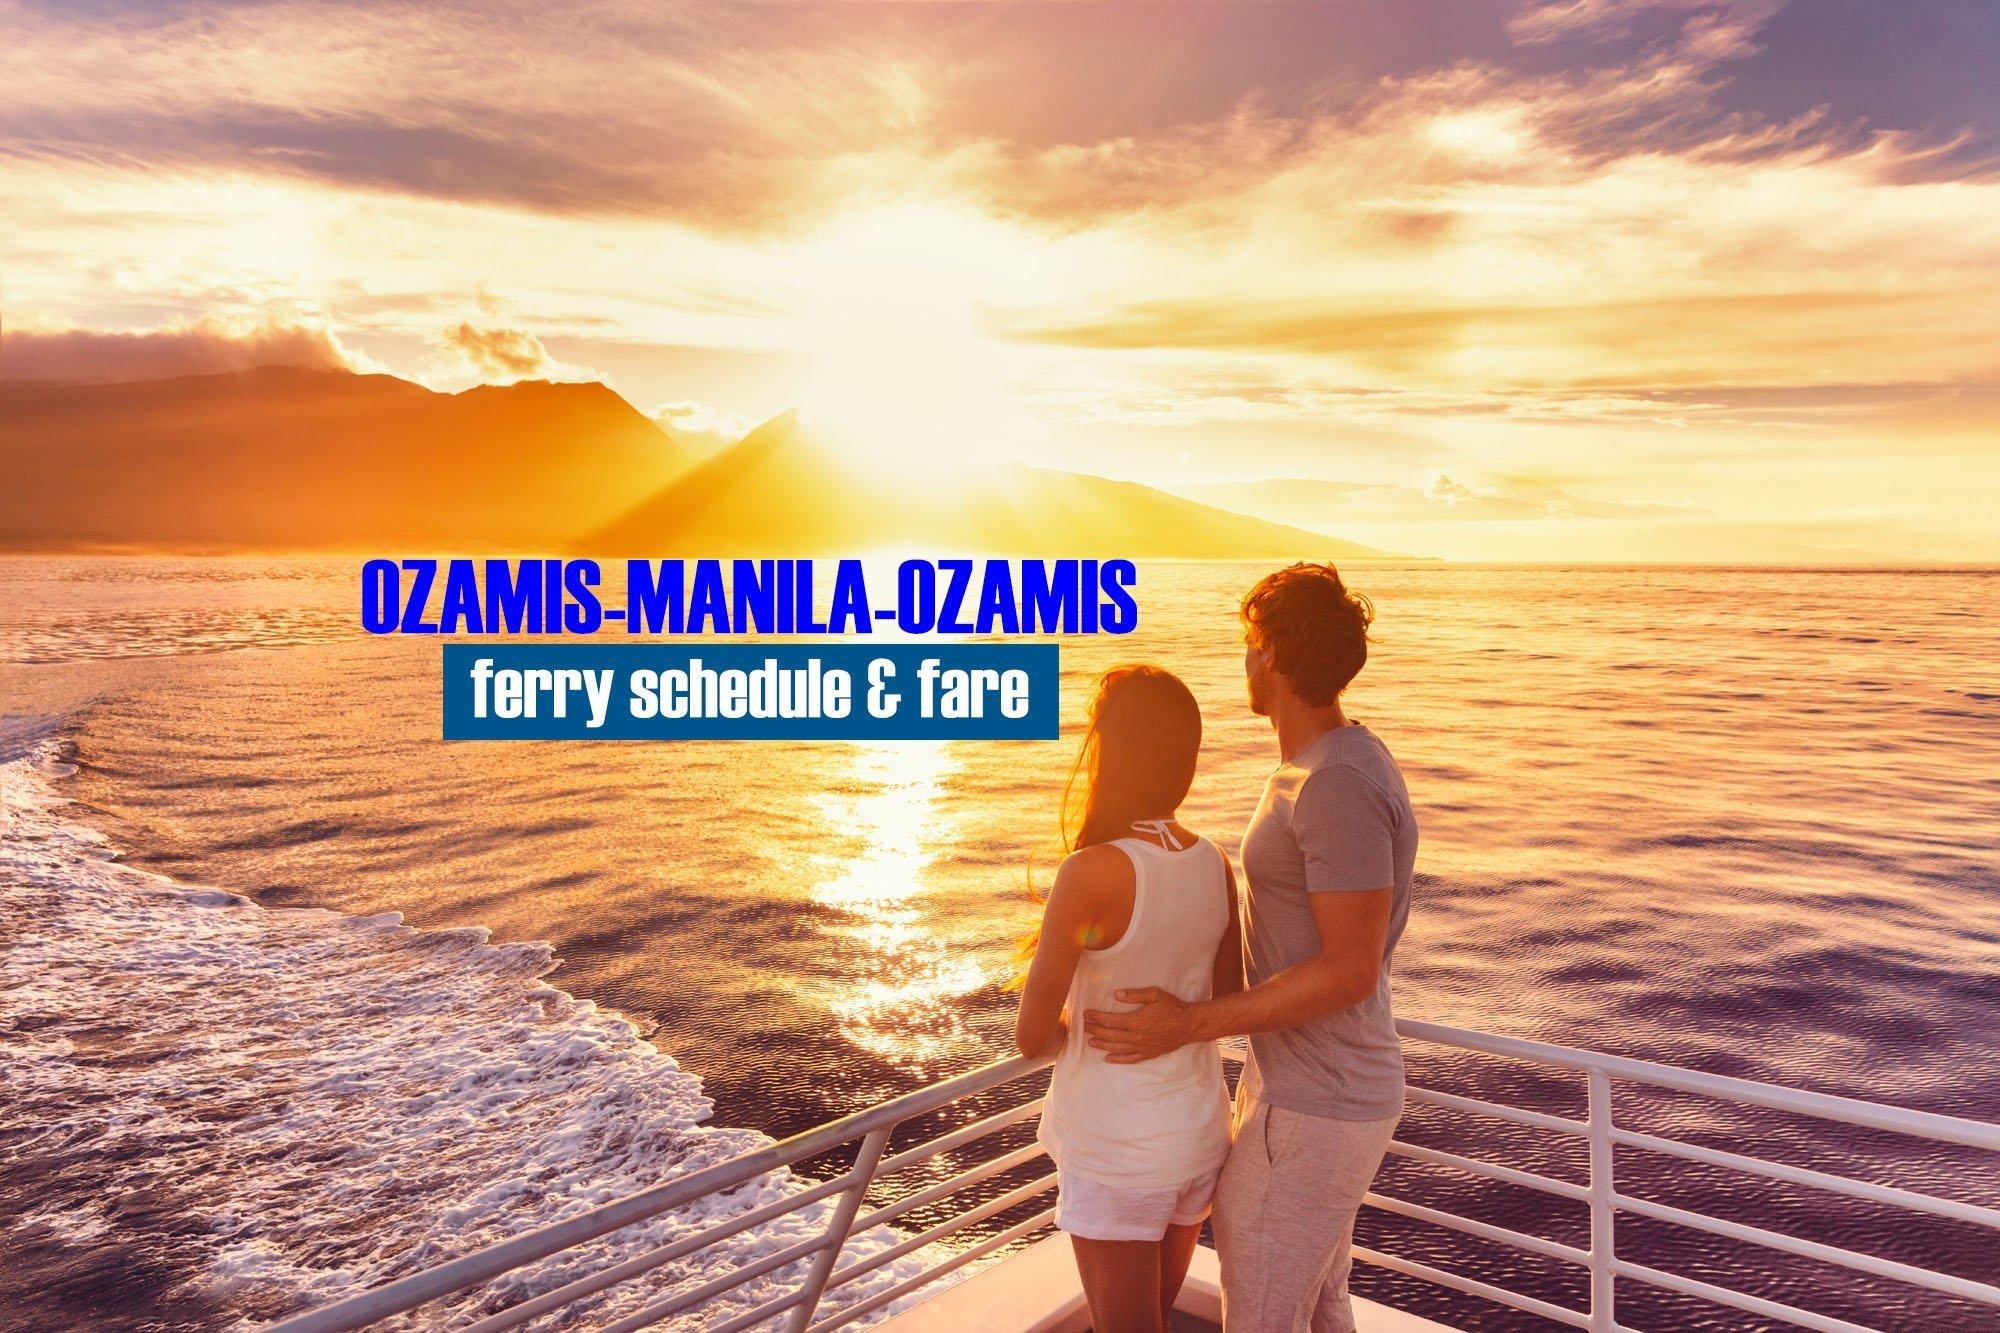 Ozamis to Manila: 2020 Ferry Schedule & Fare